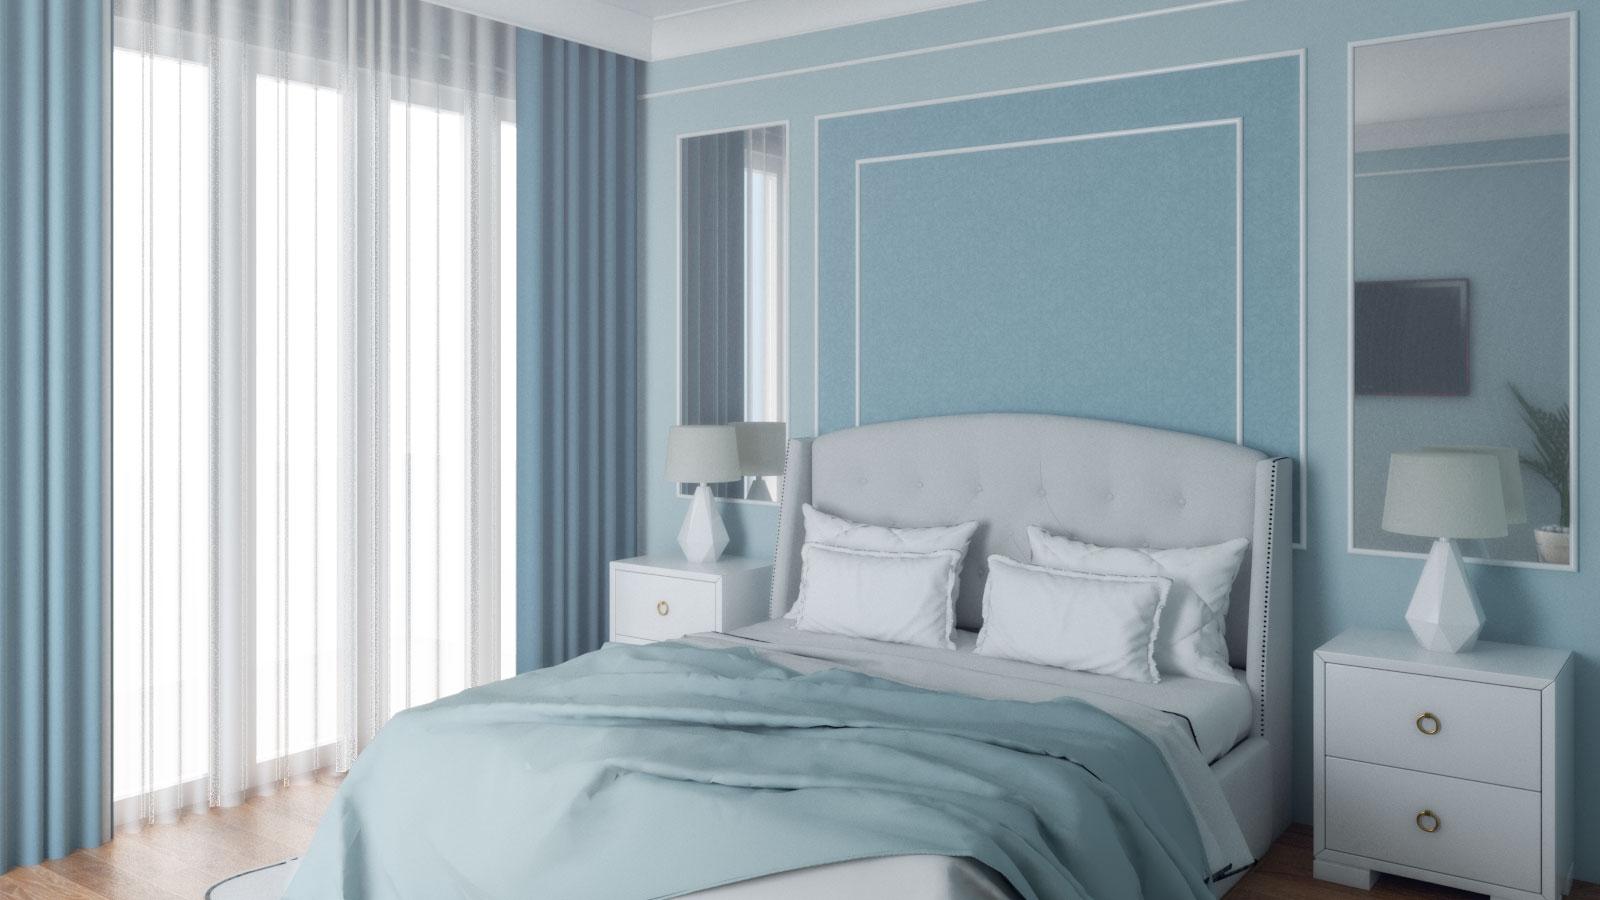 Classic Light Blue Bedroom Roomdsign Com